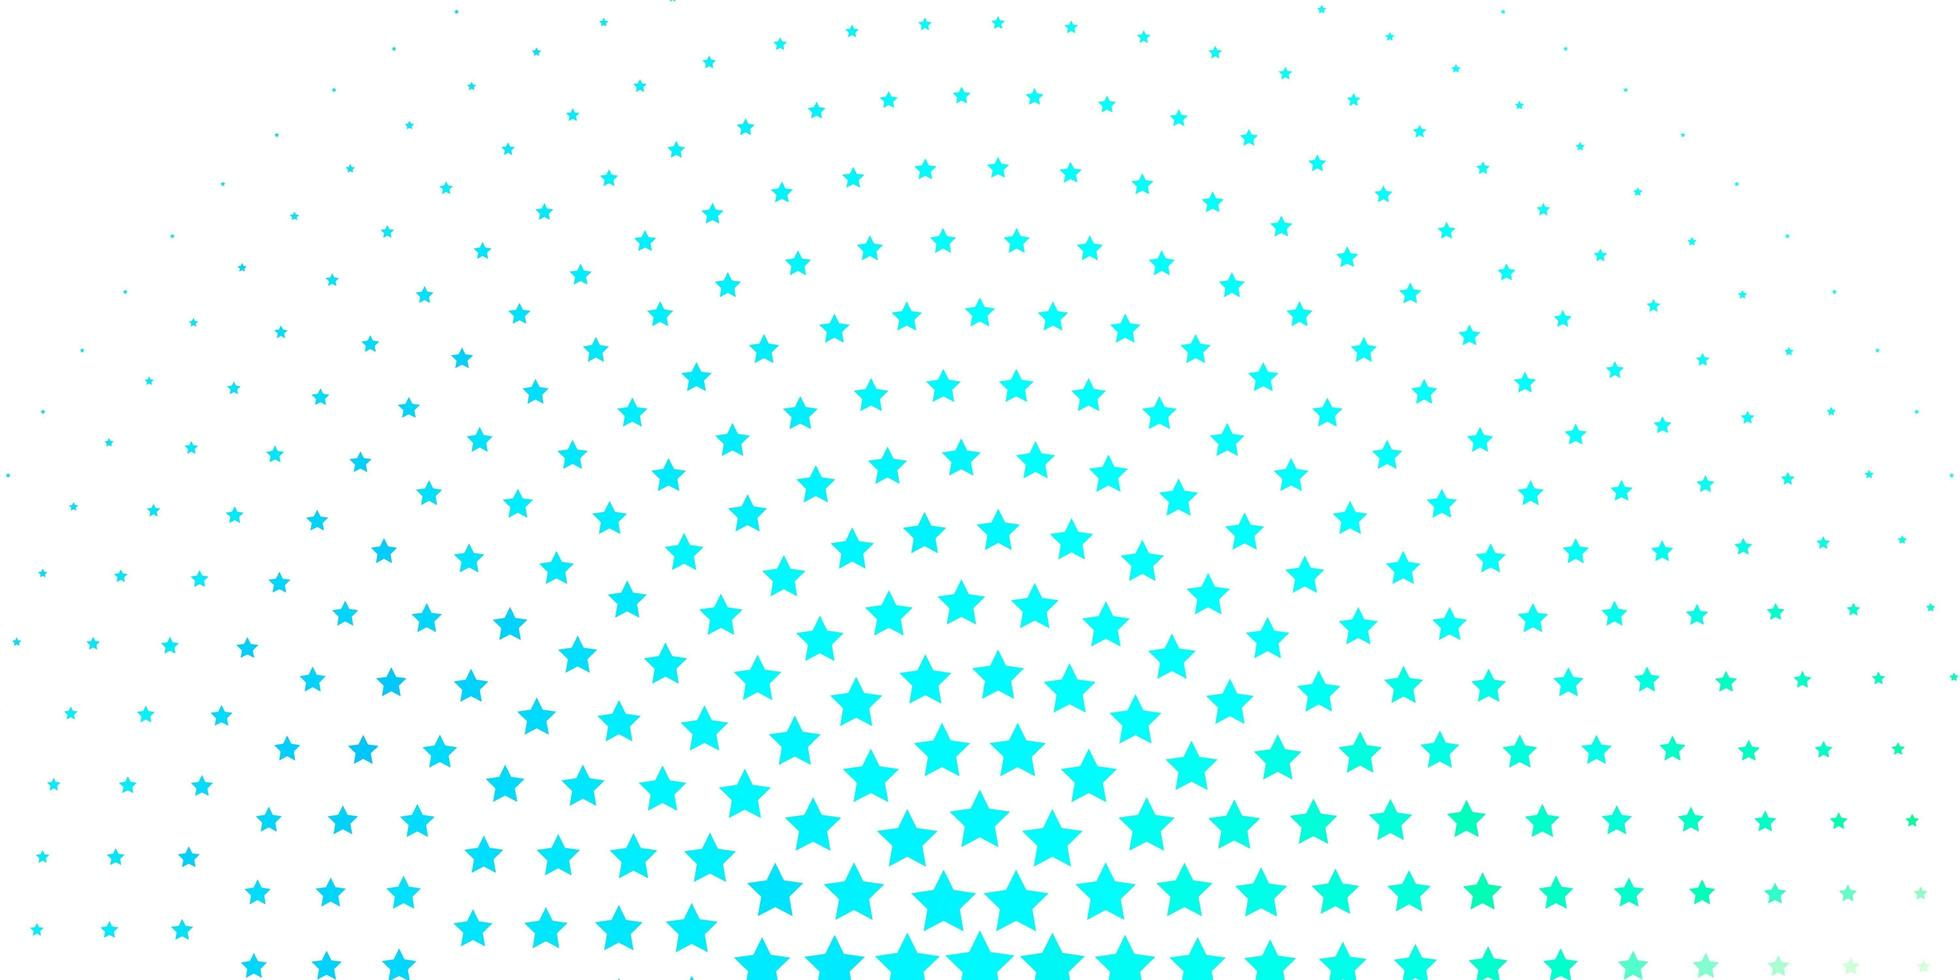 Fondo de estrellas azules degradado. vector